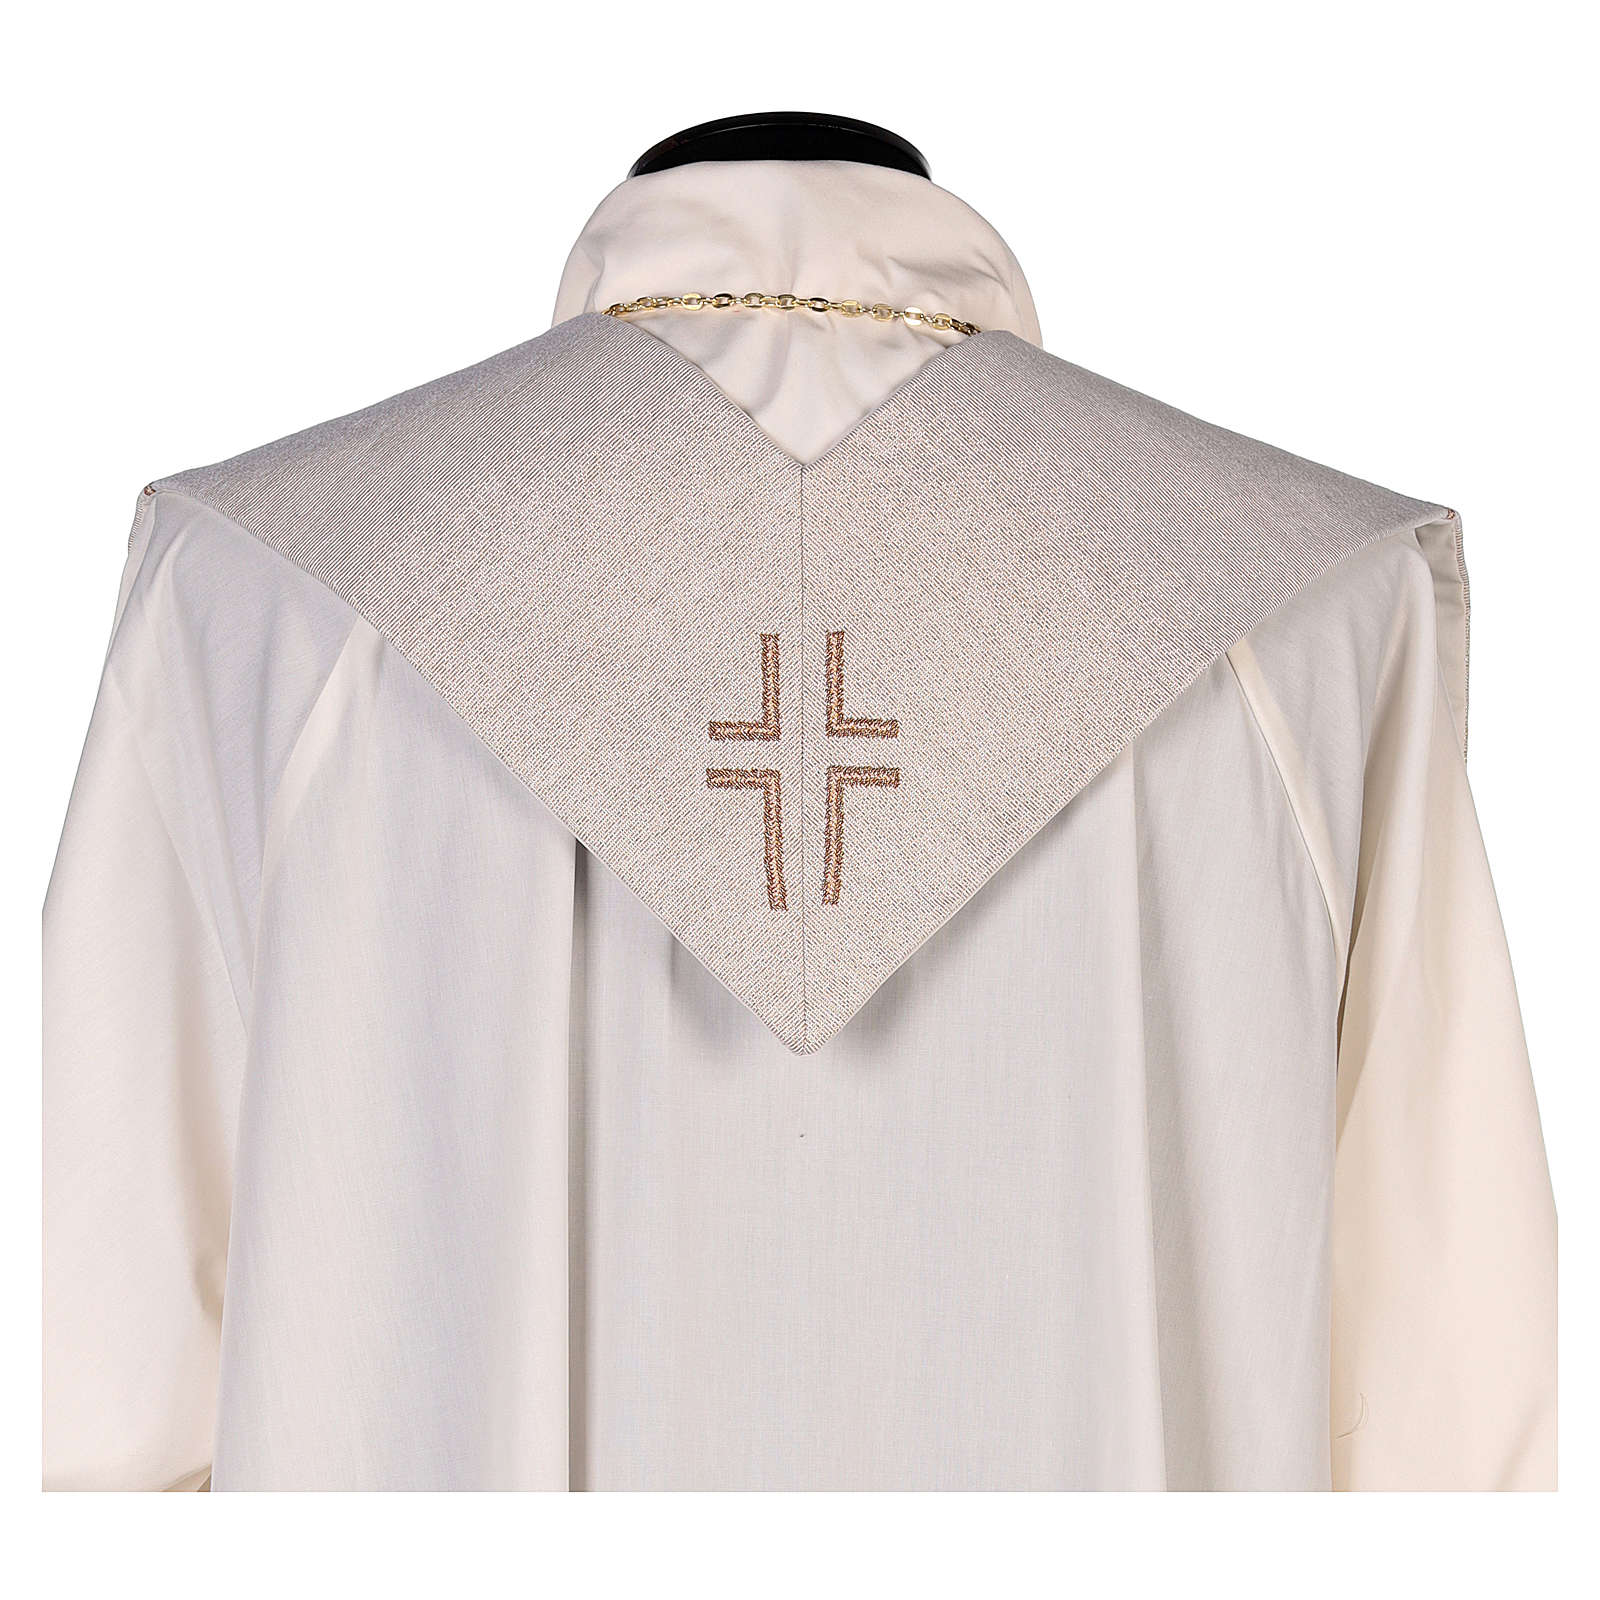 Stola San Matteo Evangelista con uomo alato avorio 4